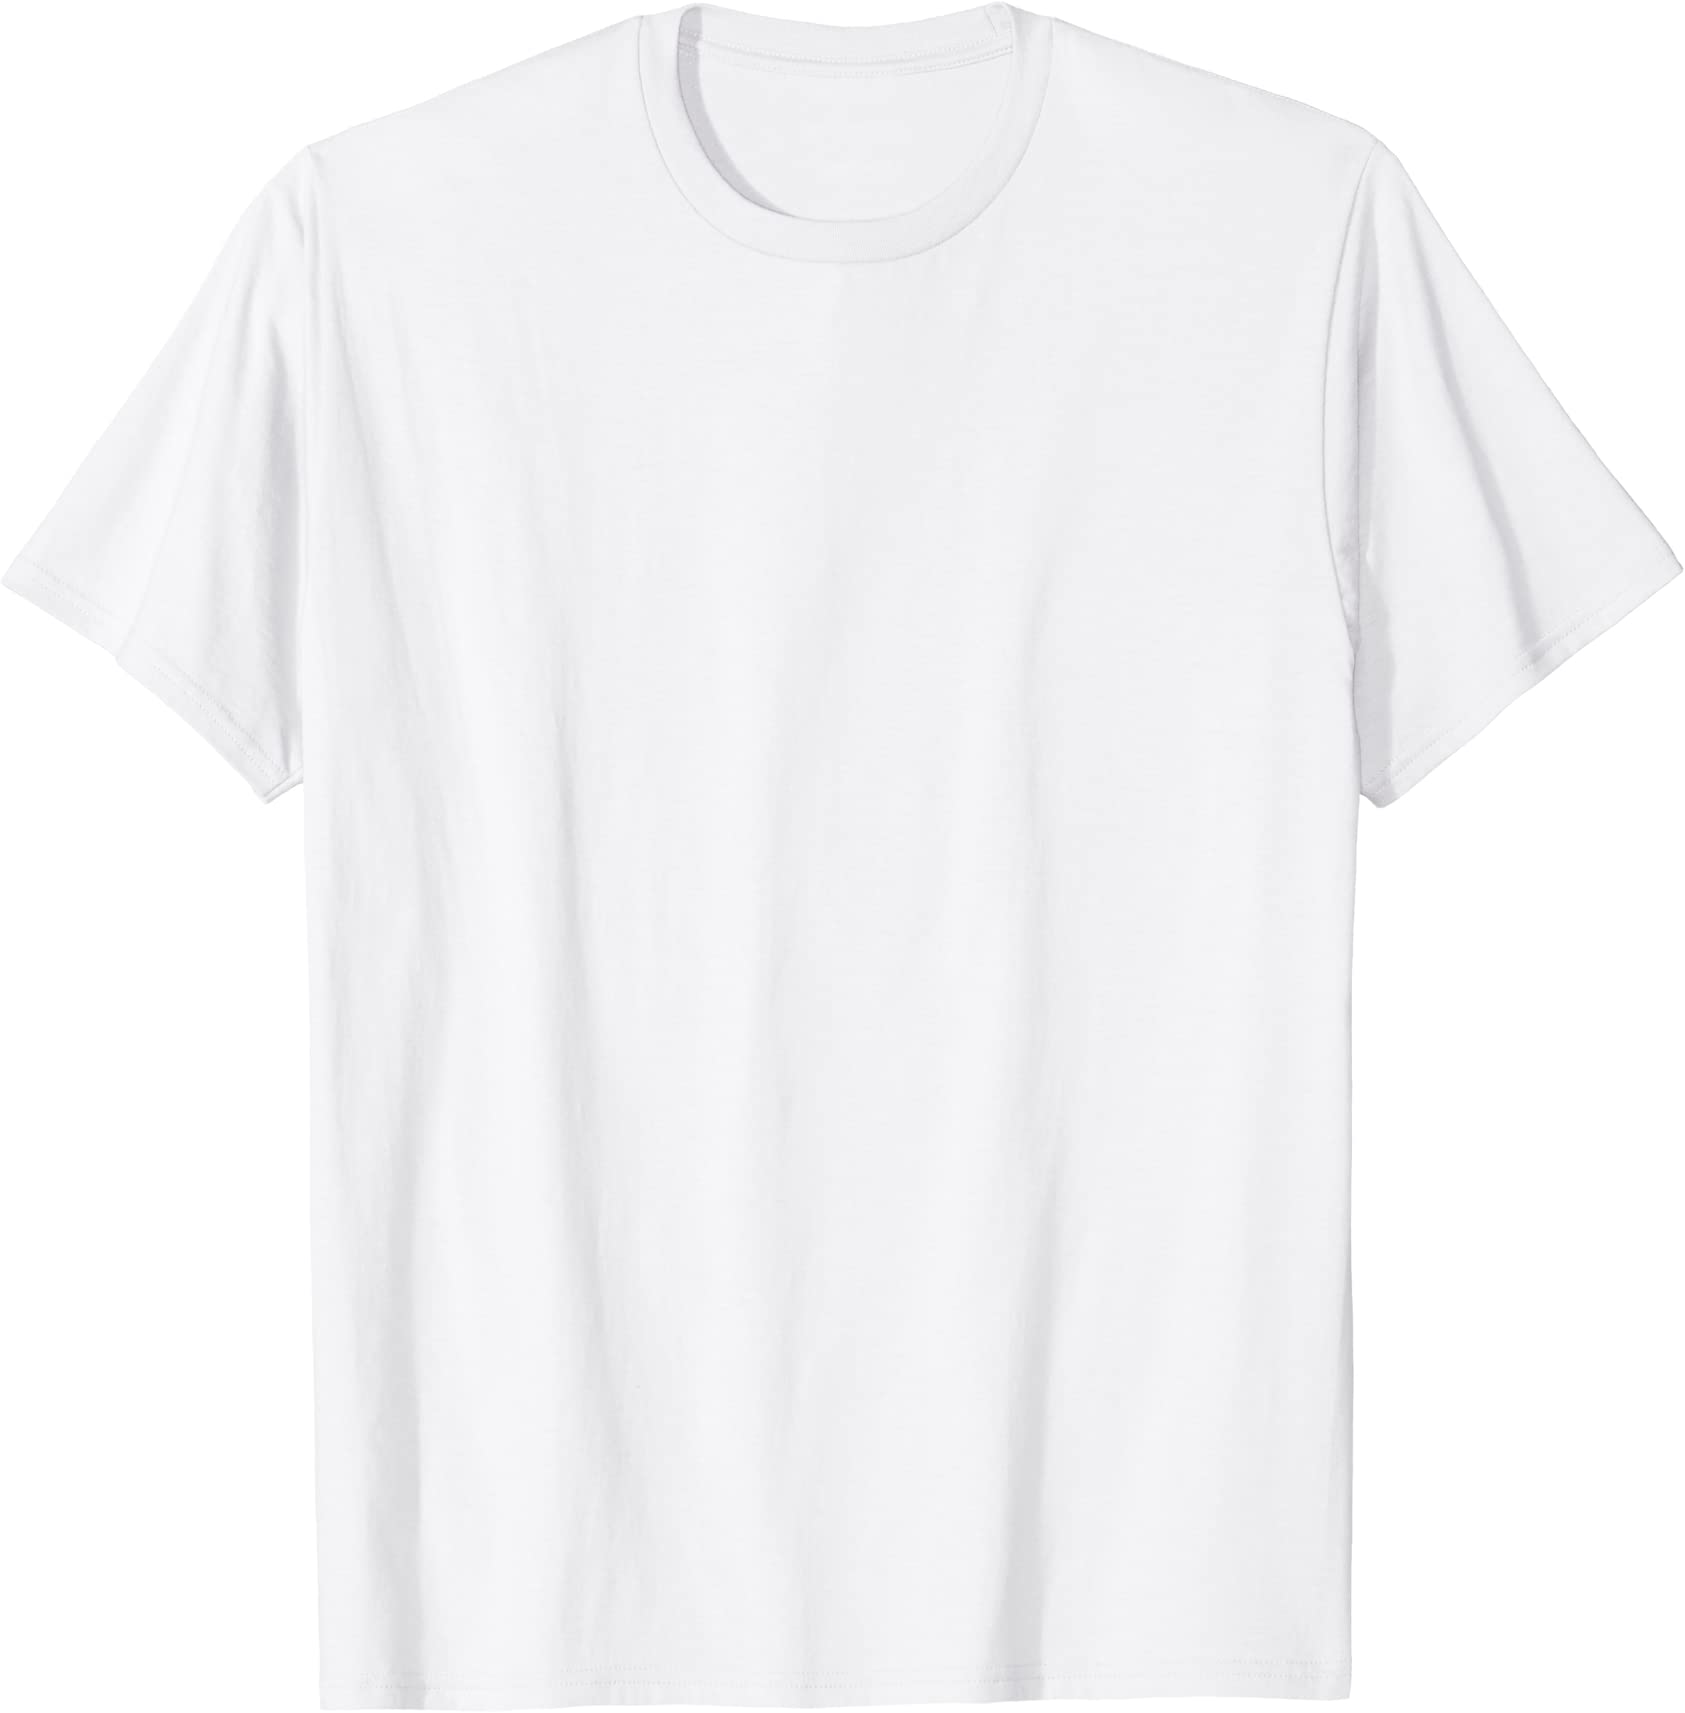 It/'s my Unicorn Birthday 2 3 4 5 6 7 8 9 10 11 12 13 Girl Party T-shirt Tee top